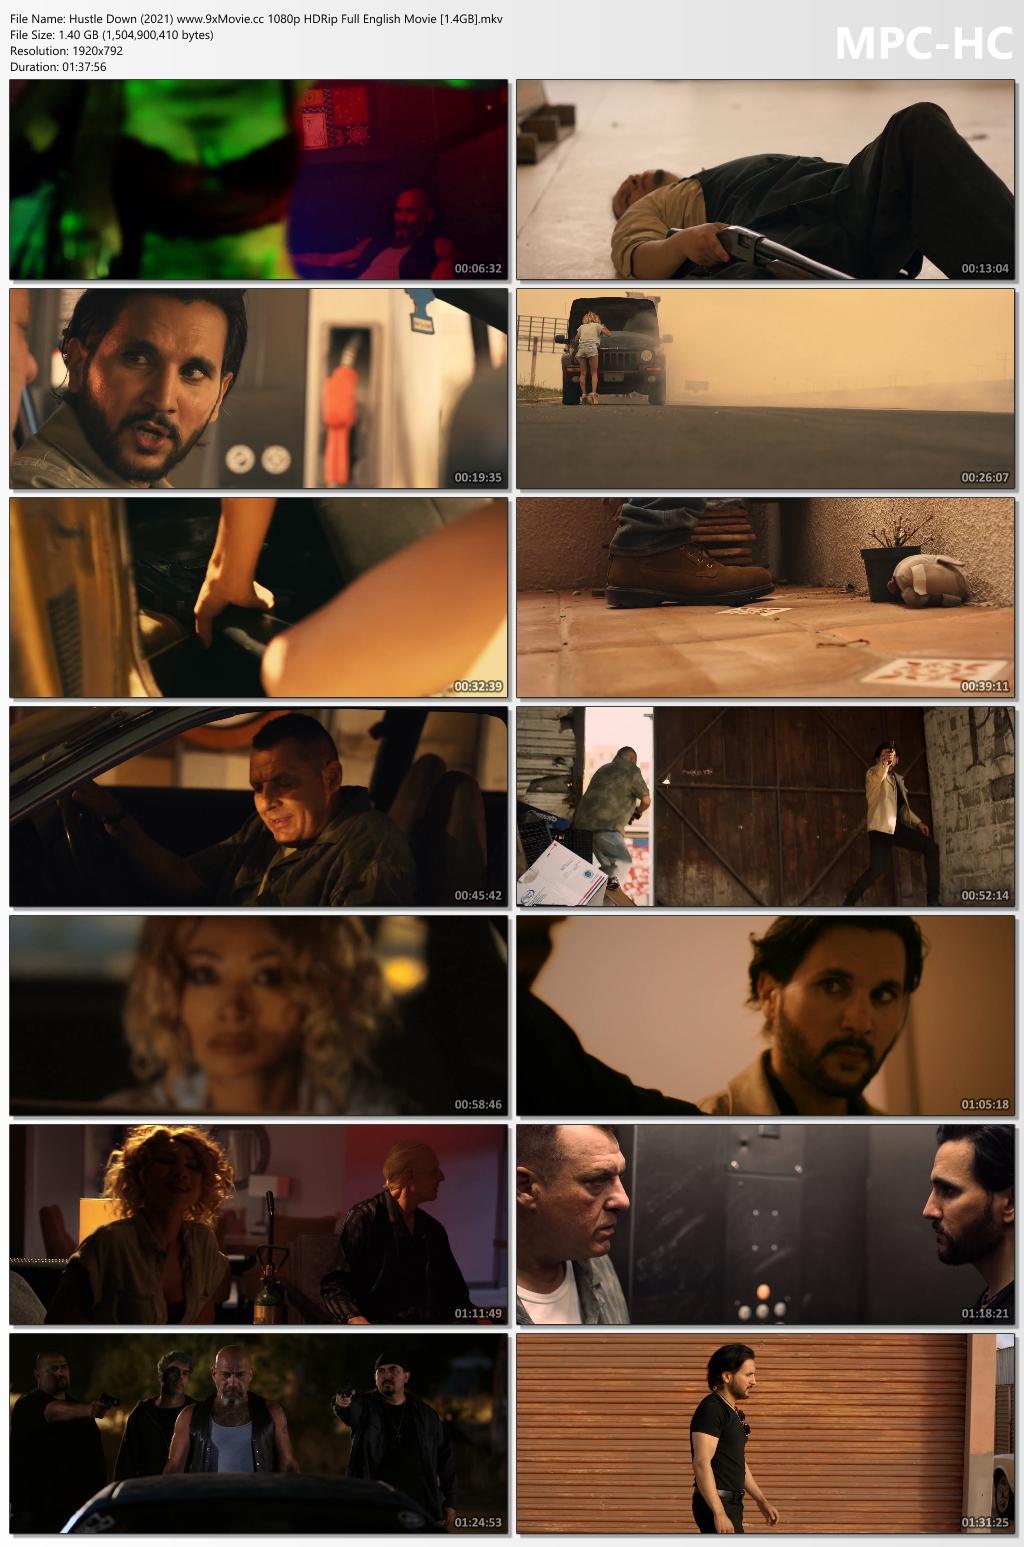 Hustle-Down-2021-www-9x-Movie-cc-1080p-HDRip-Full-English-Movie-1-4-GB-mkv